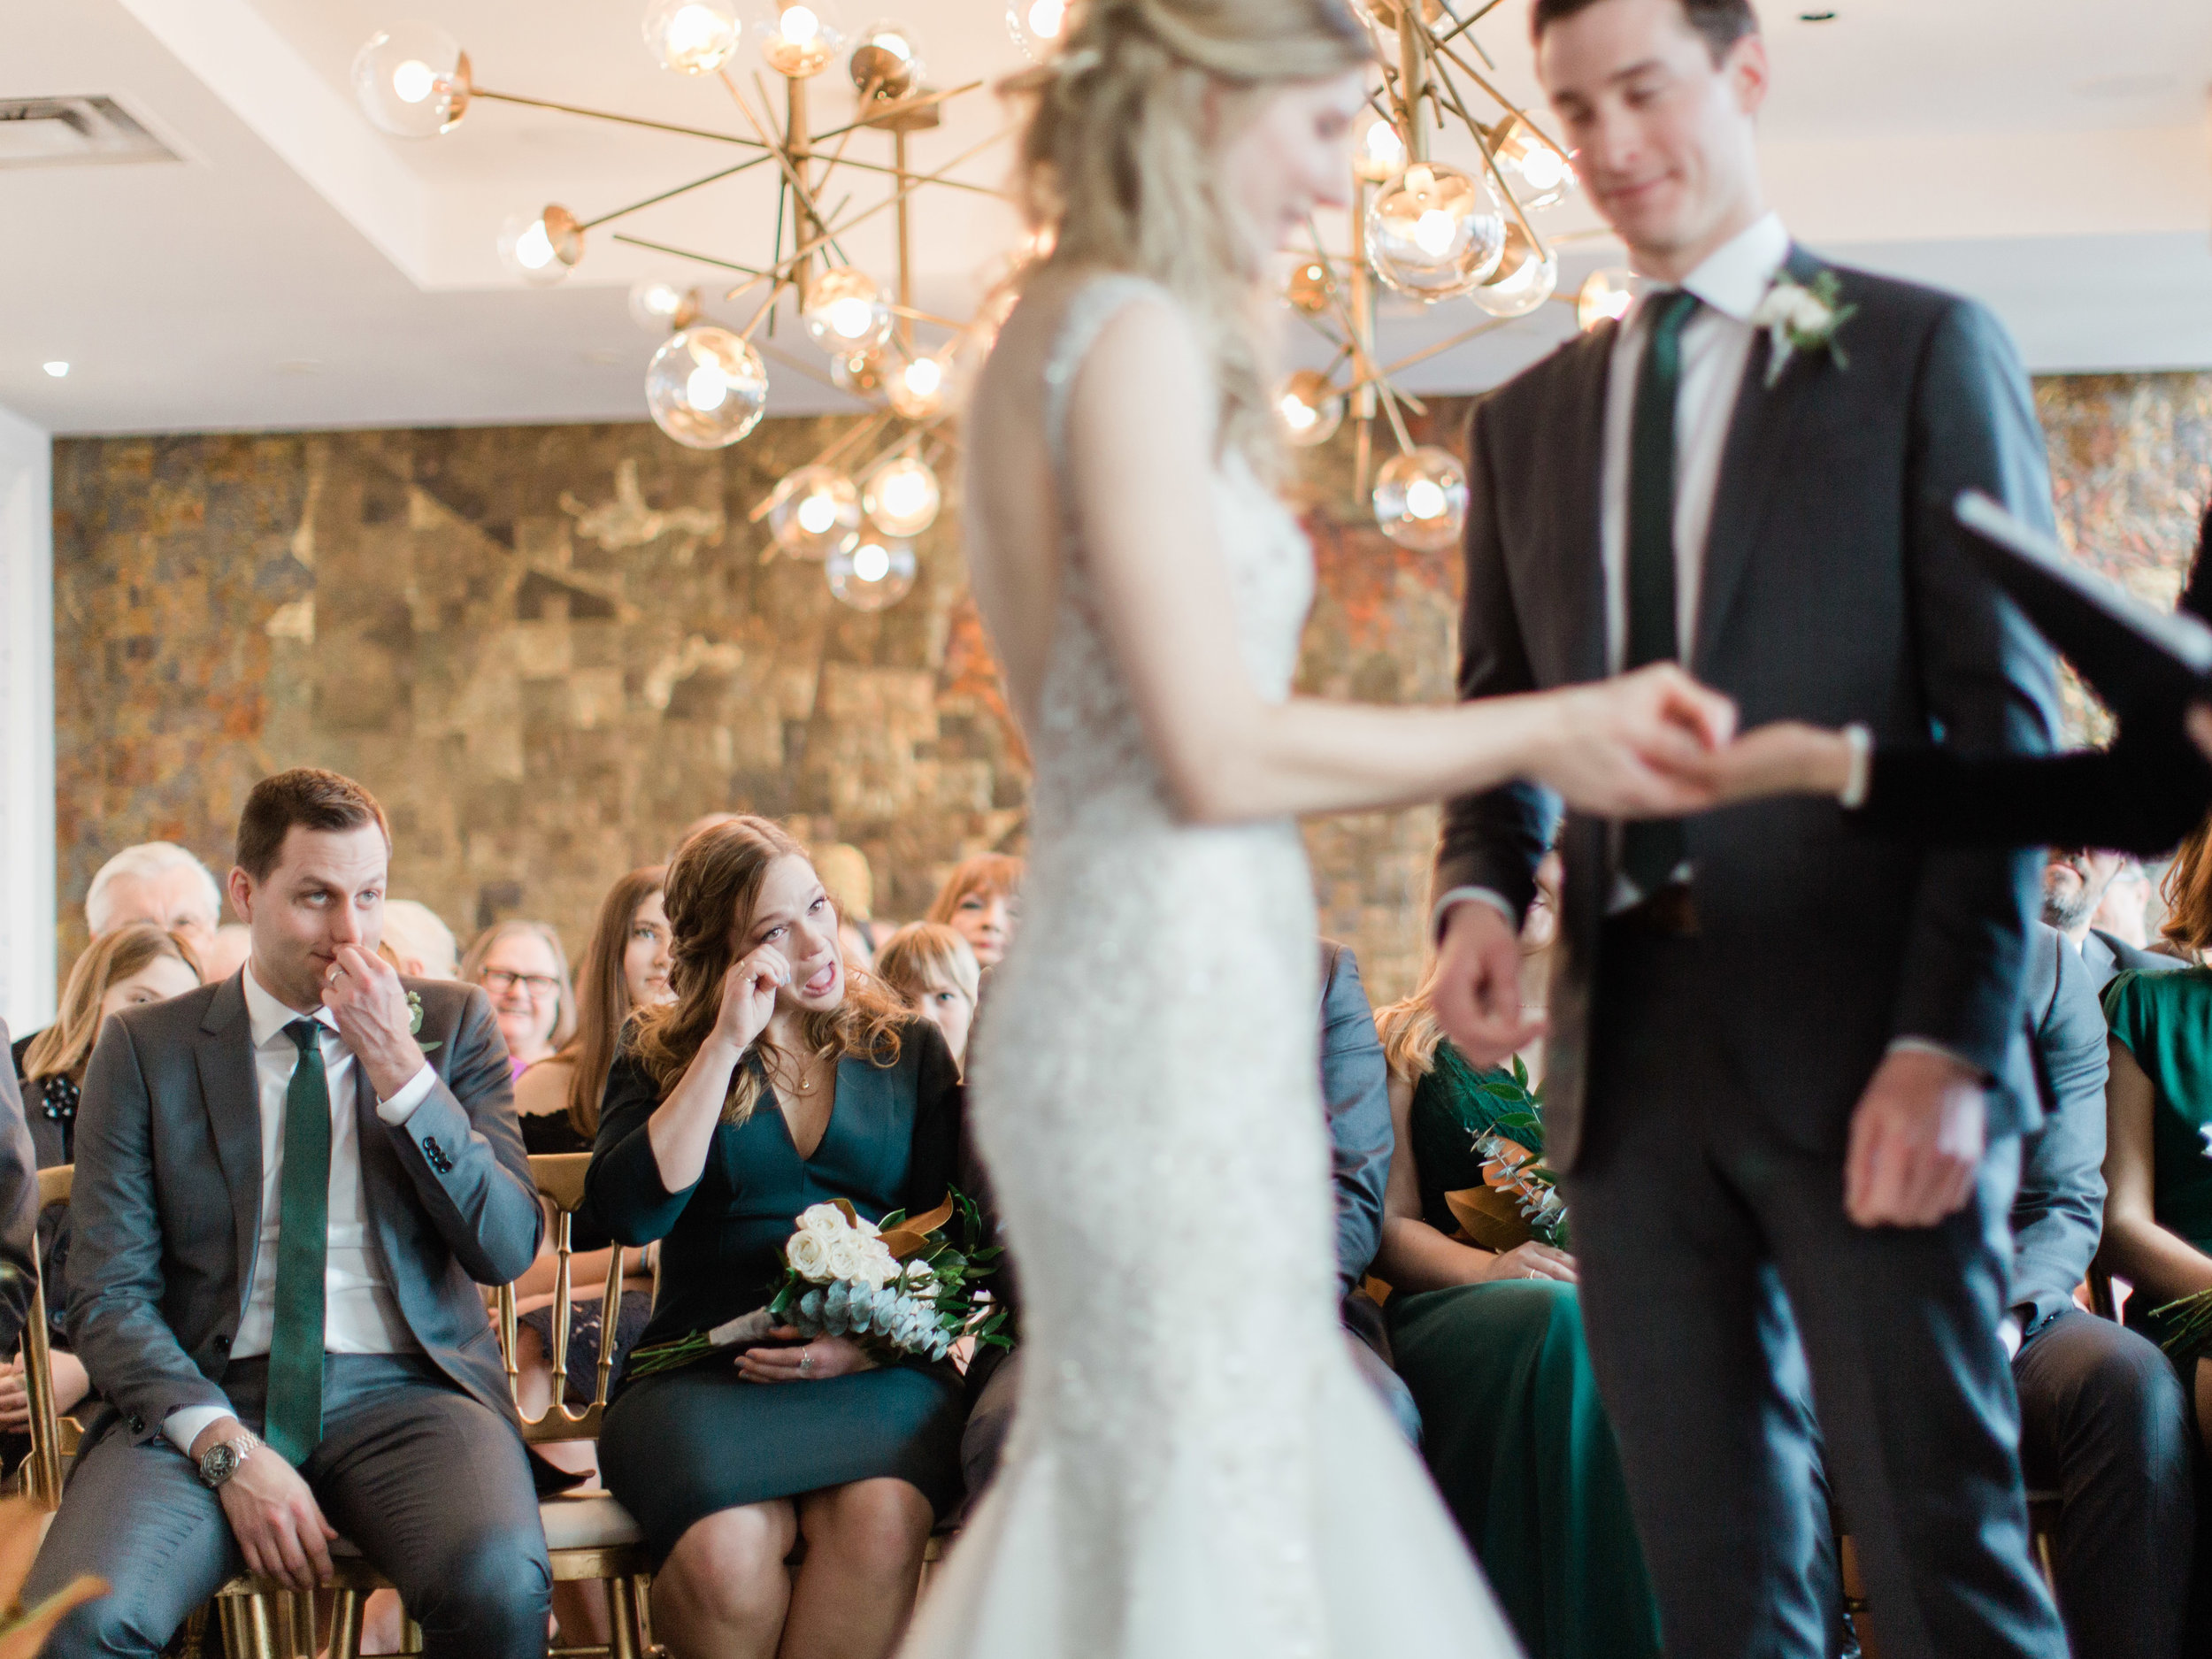 Toronto-wedding-photographer-downtown-winter-wedding-intimate-restaurant-canoe141.jpg